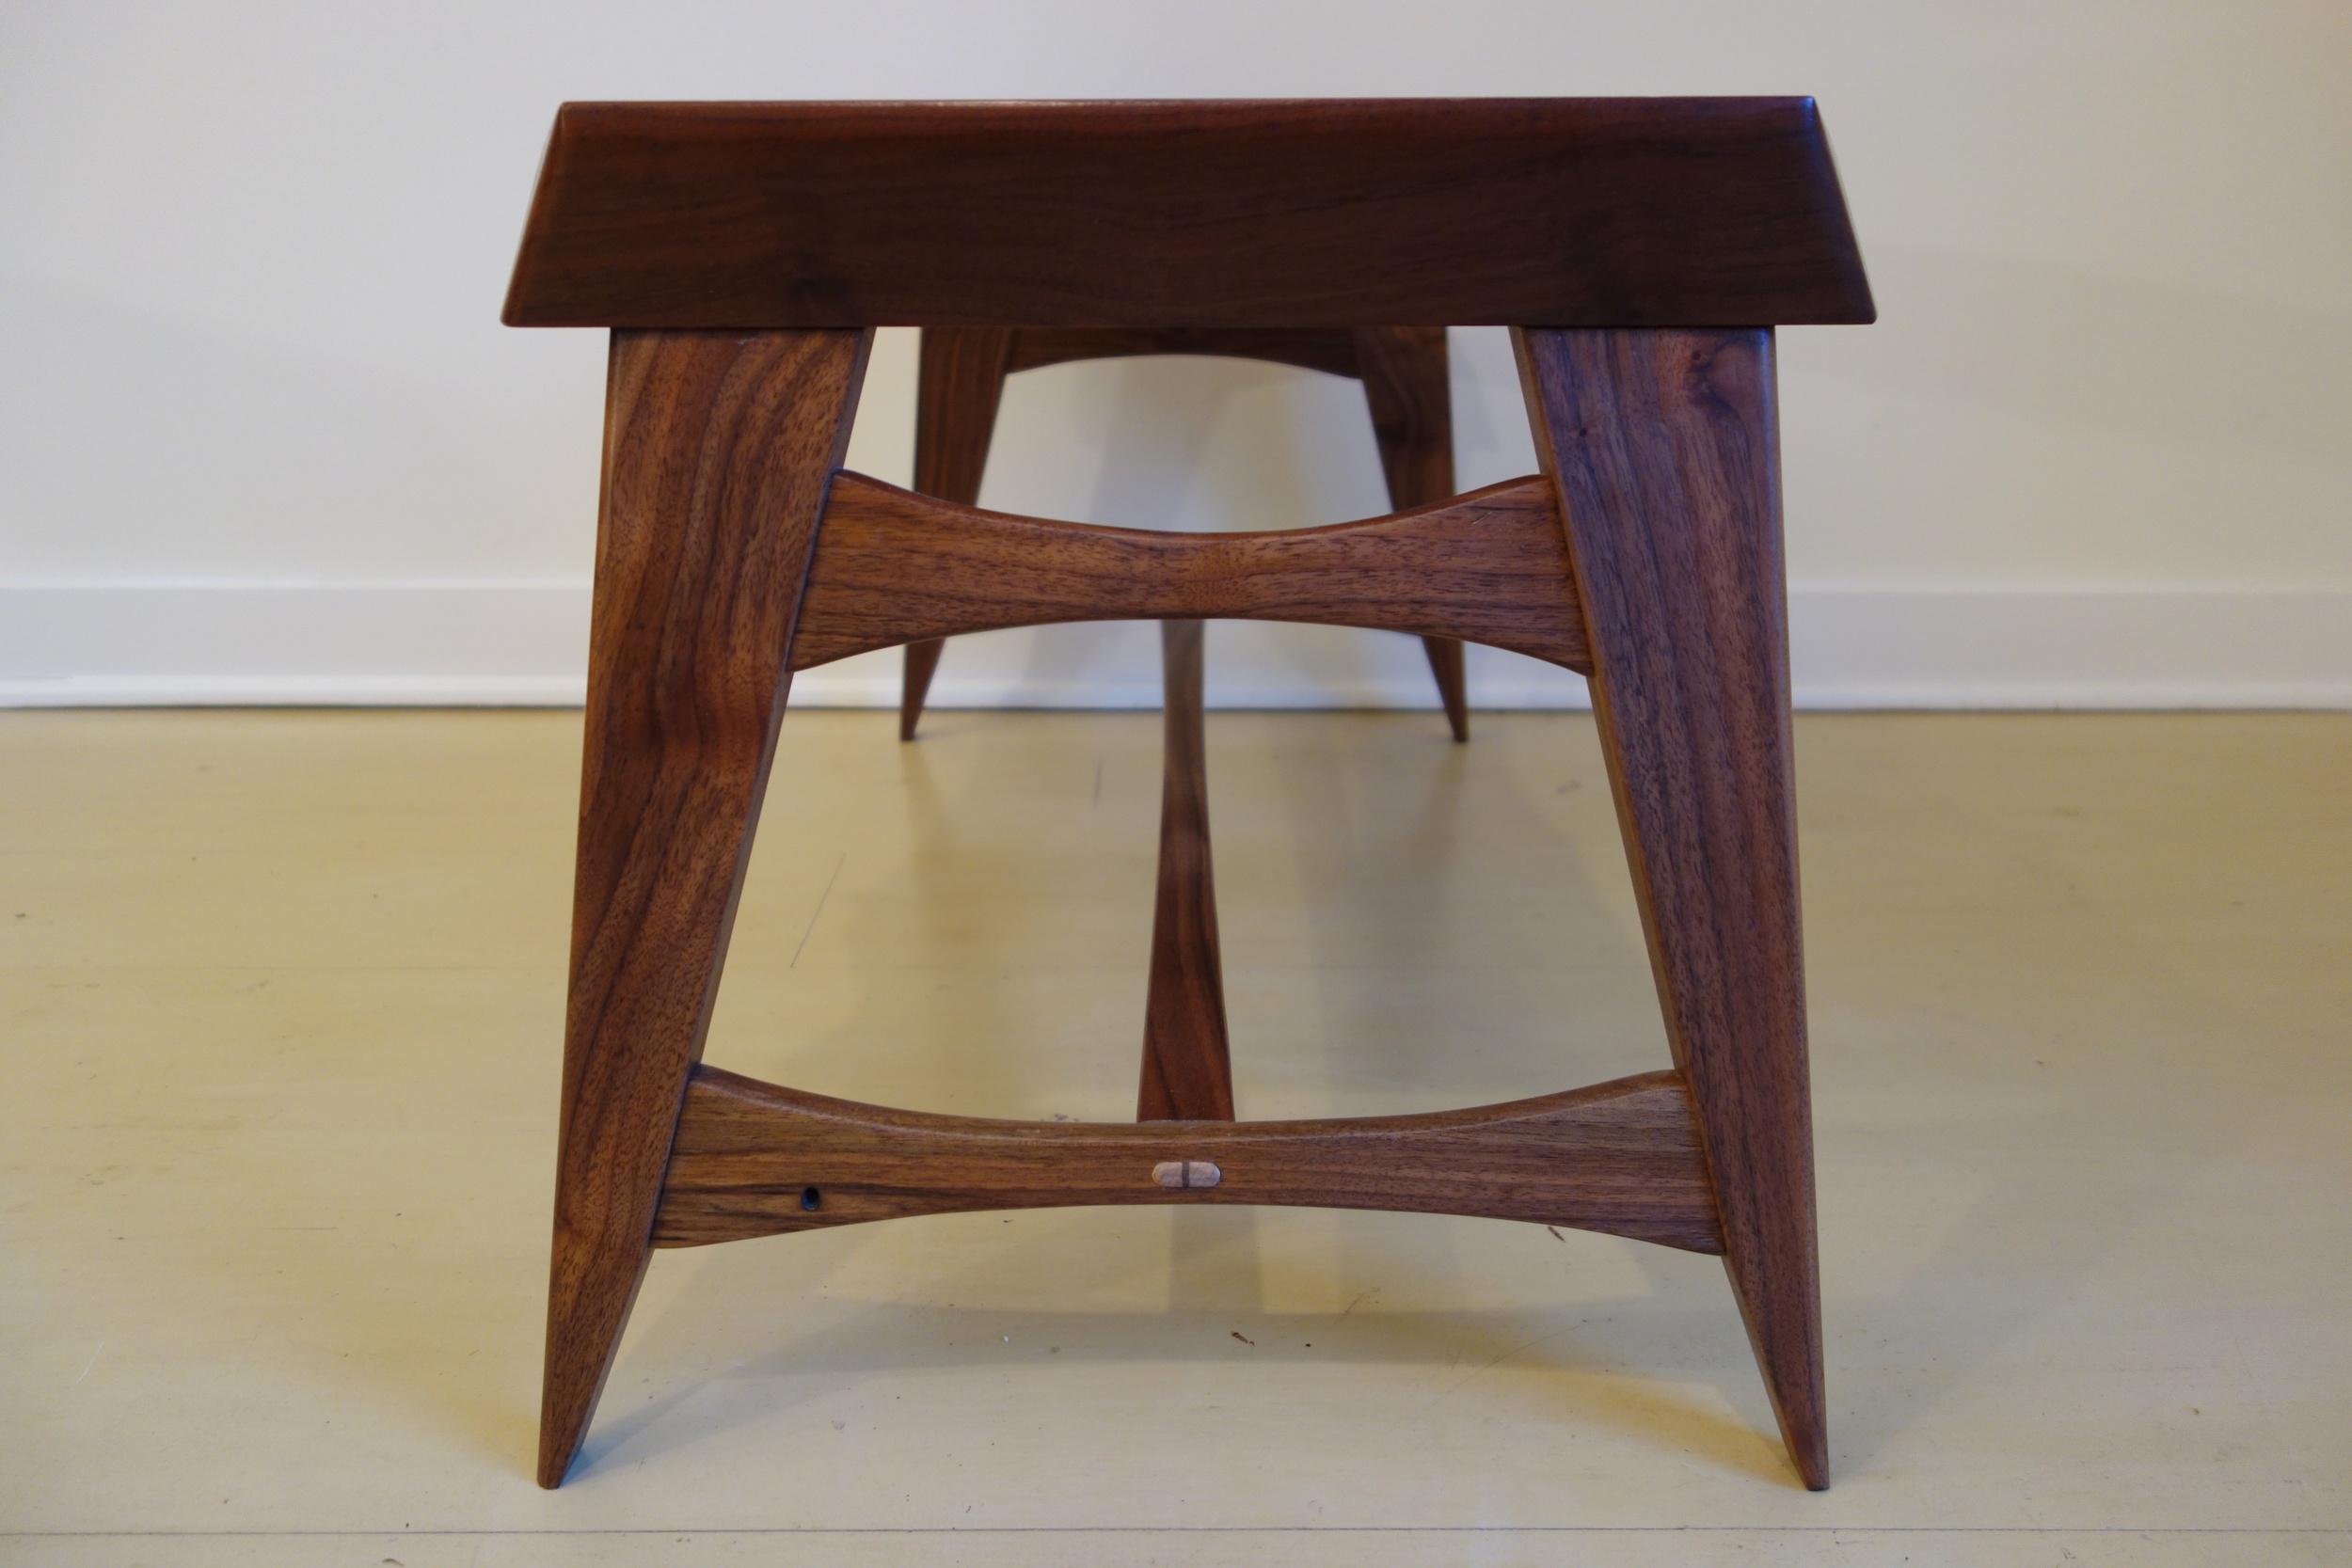 Johnny_A_Williams_Rex_Coffee_Table_3.jpg